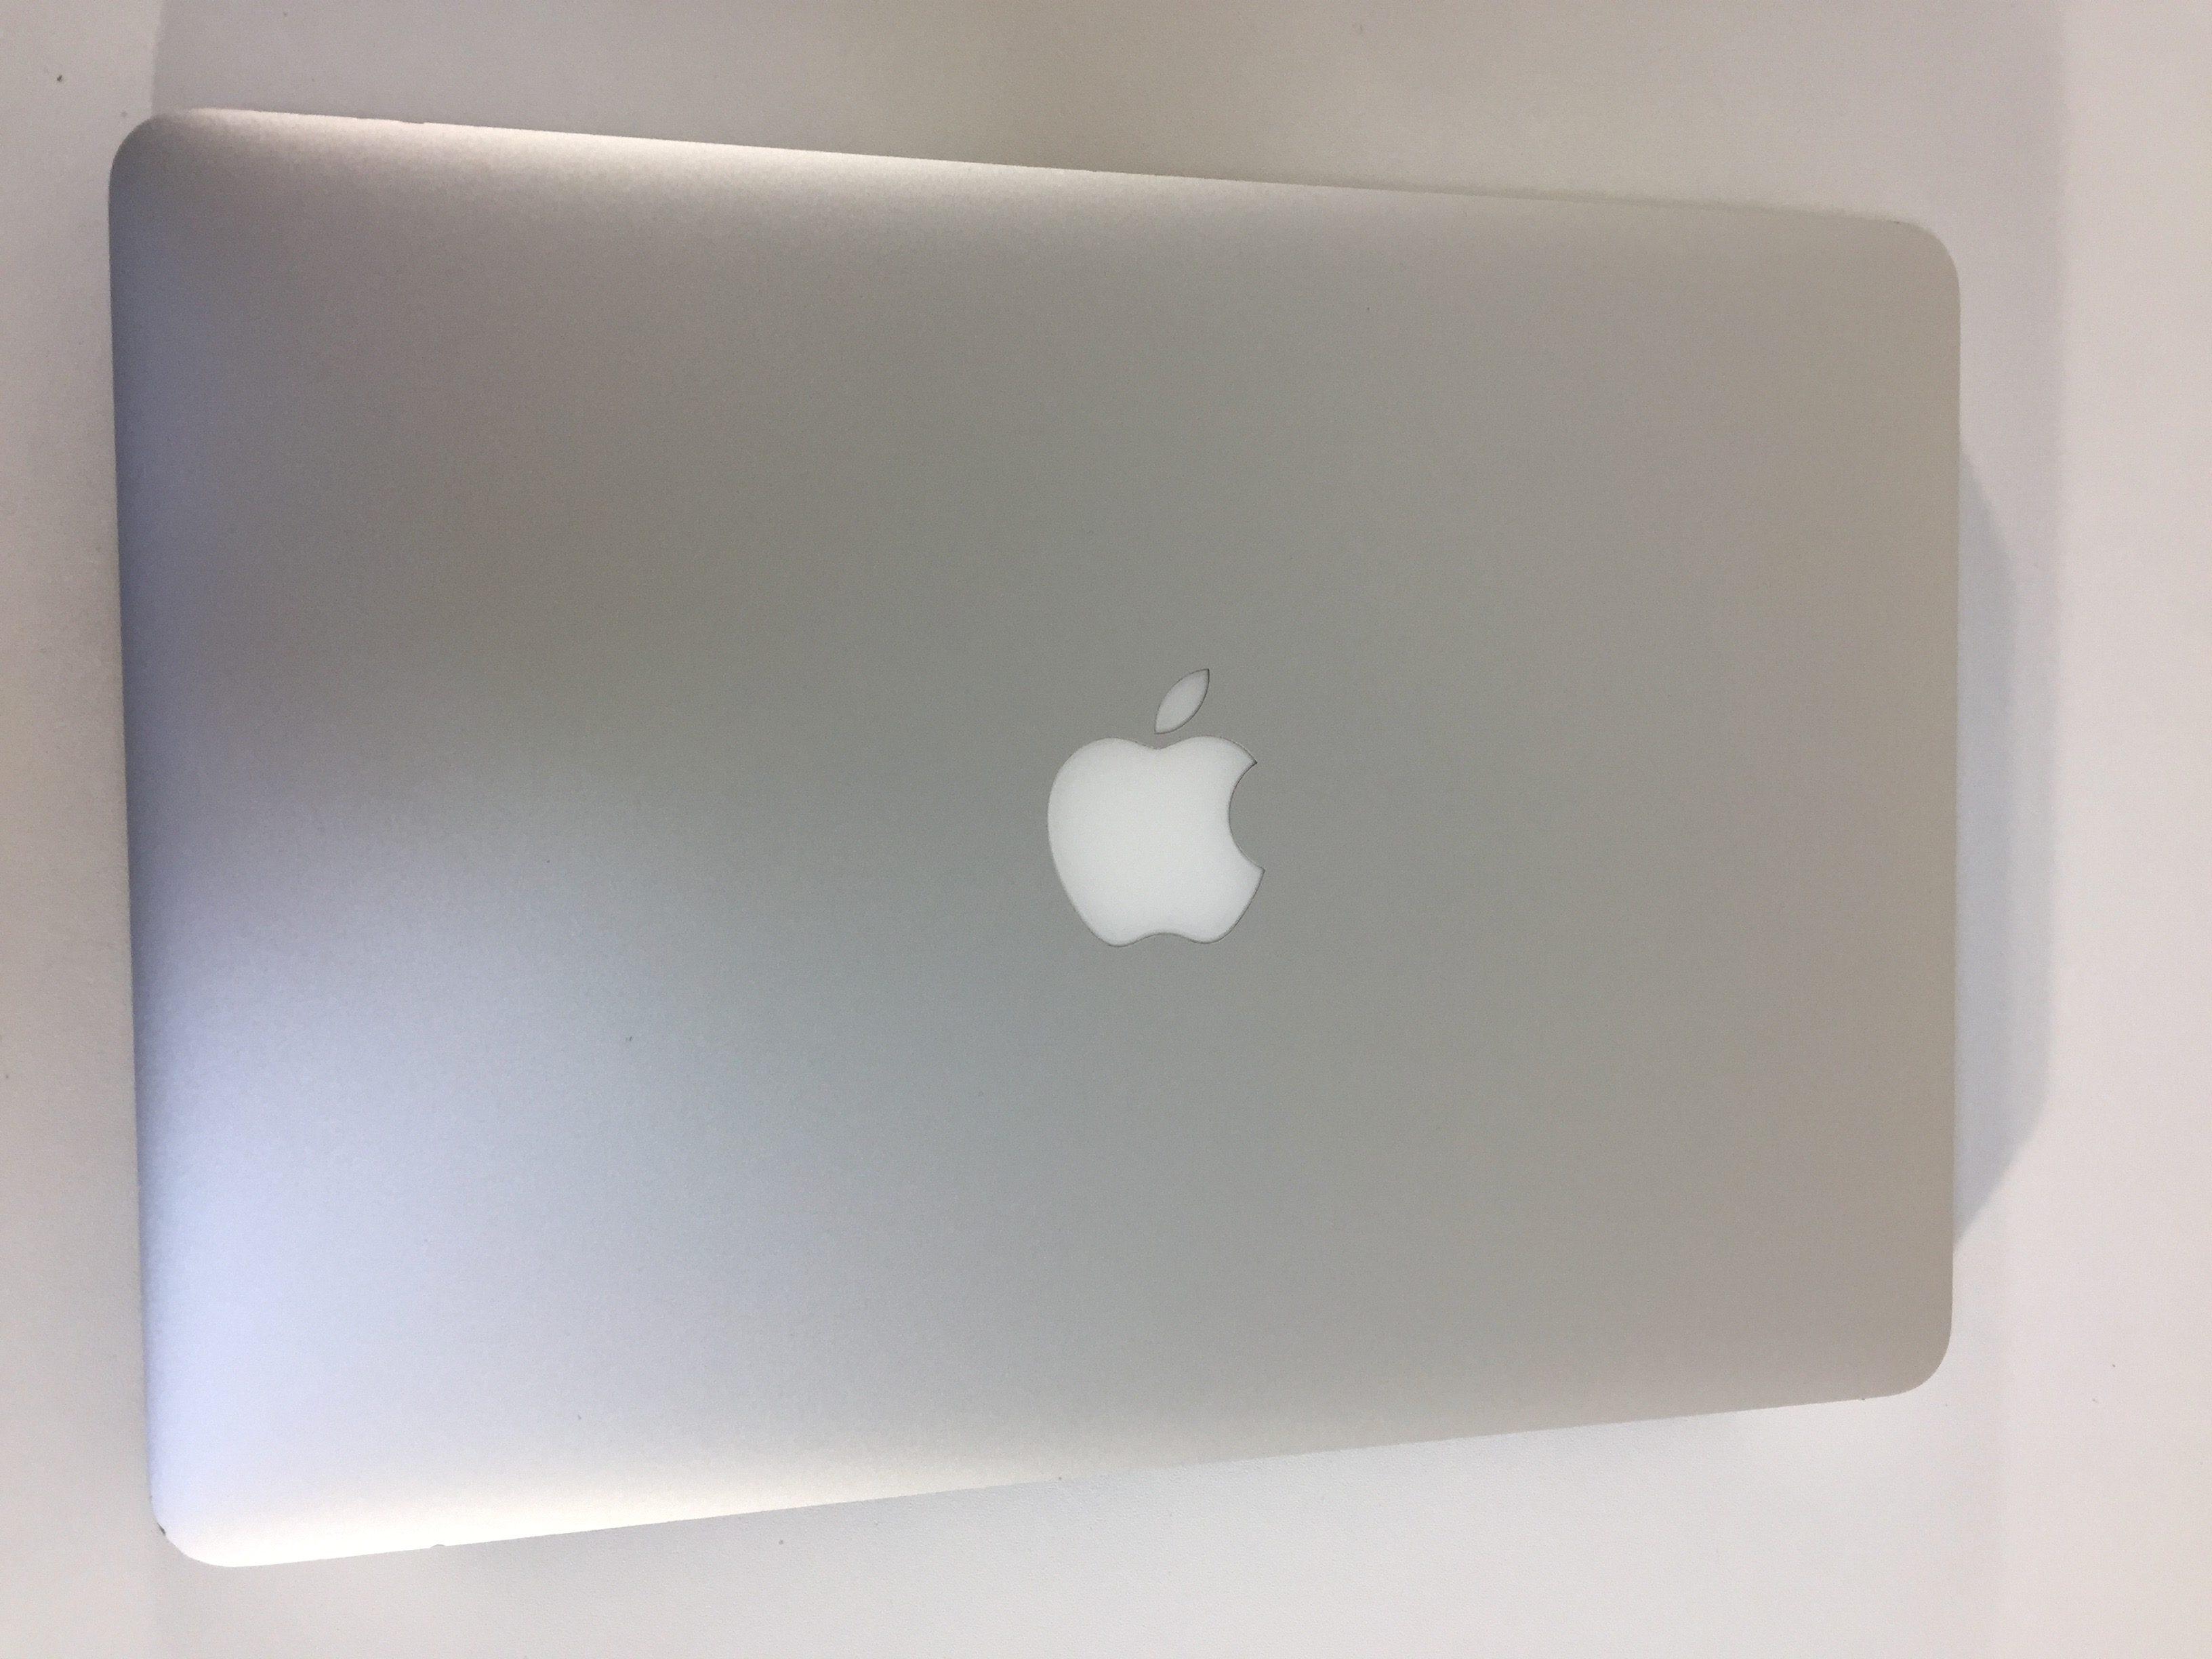 MacBook Pro 13-inch Retina, 2.6 GHz Intel Core i5, 16 GB , 128 GB Flash, Bild 2